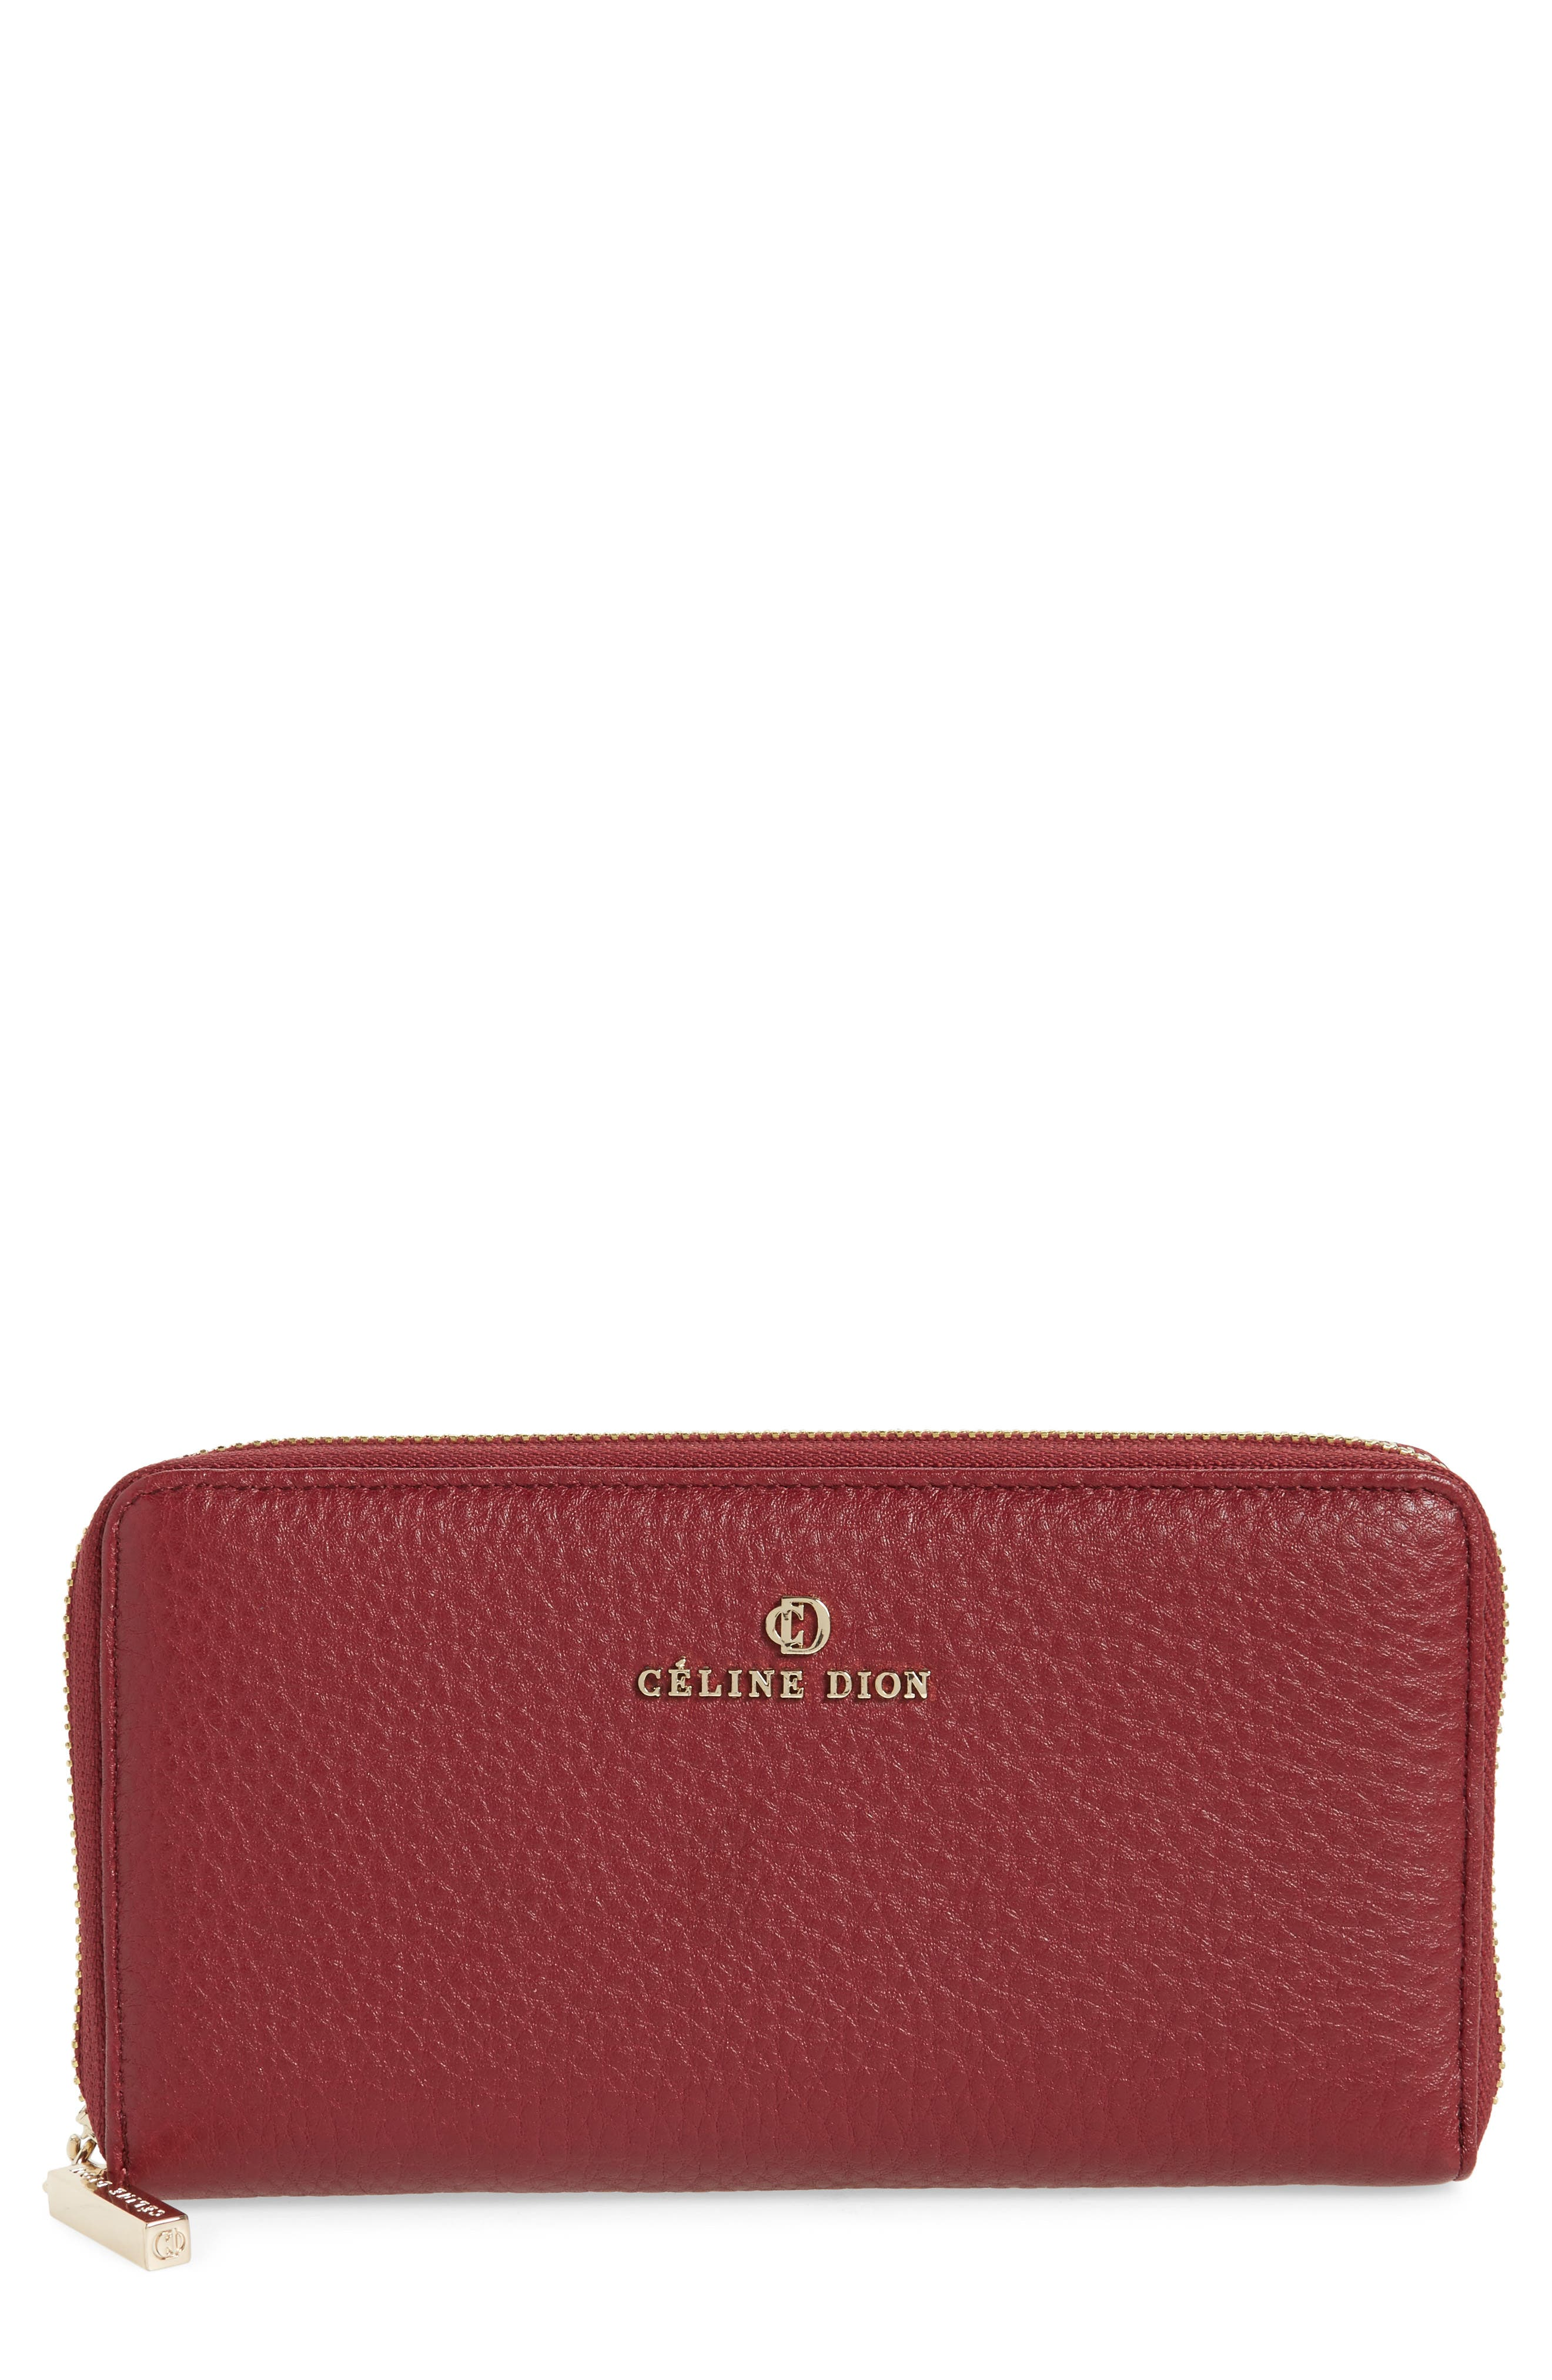 Main Image - Céline Dion Adagio Leather Wallet